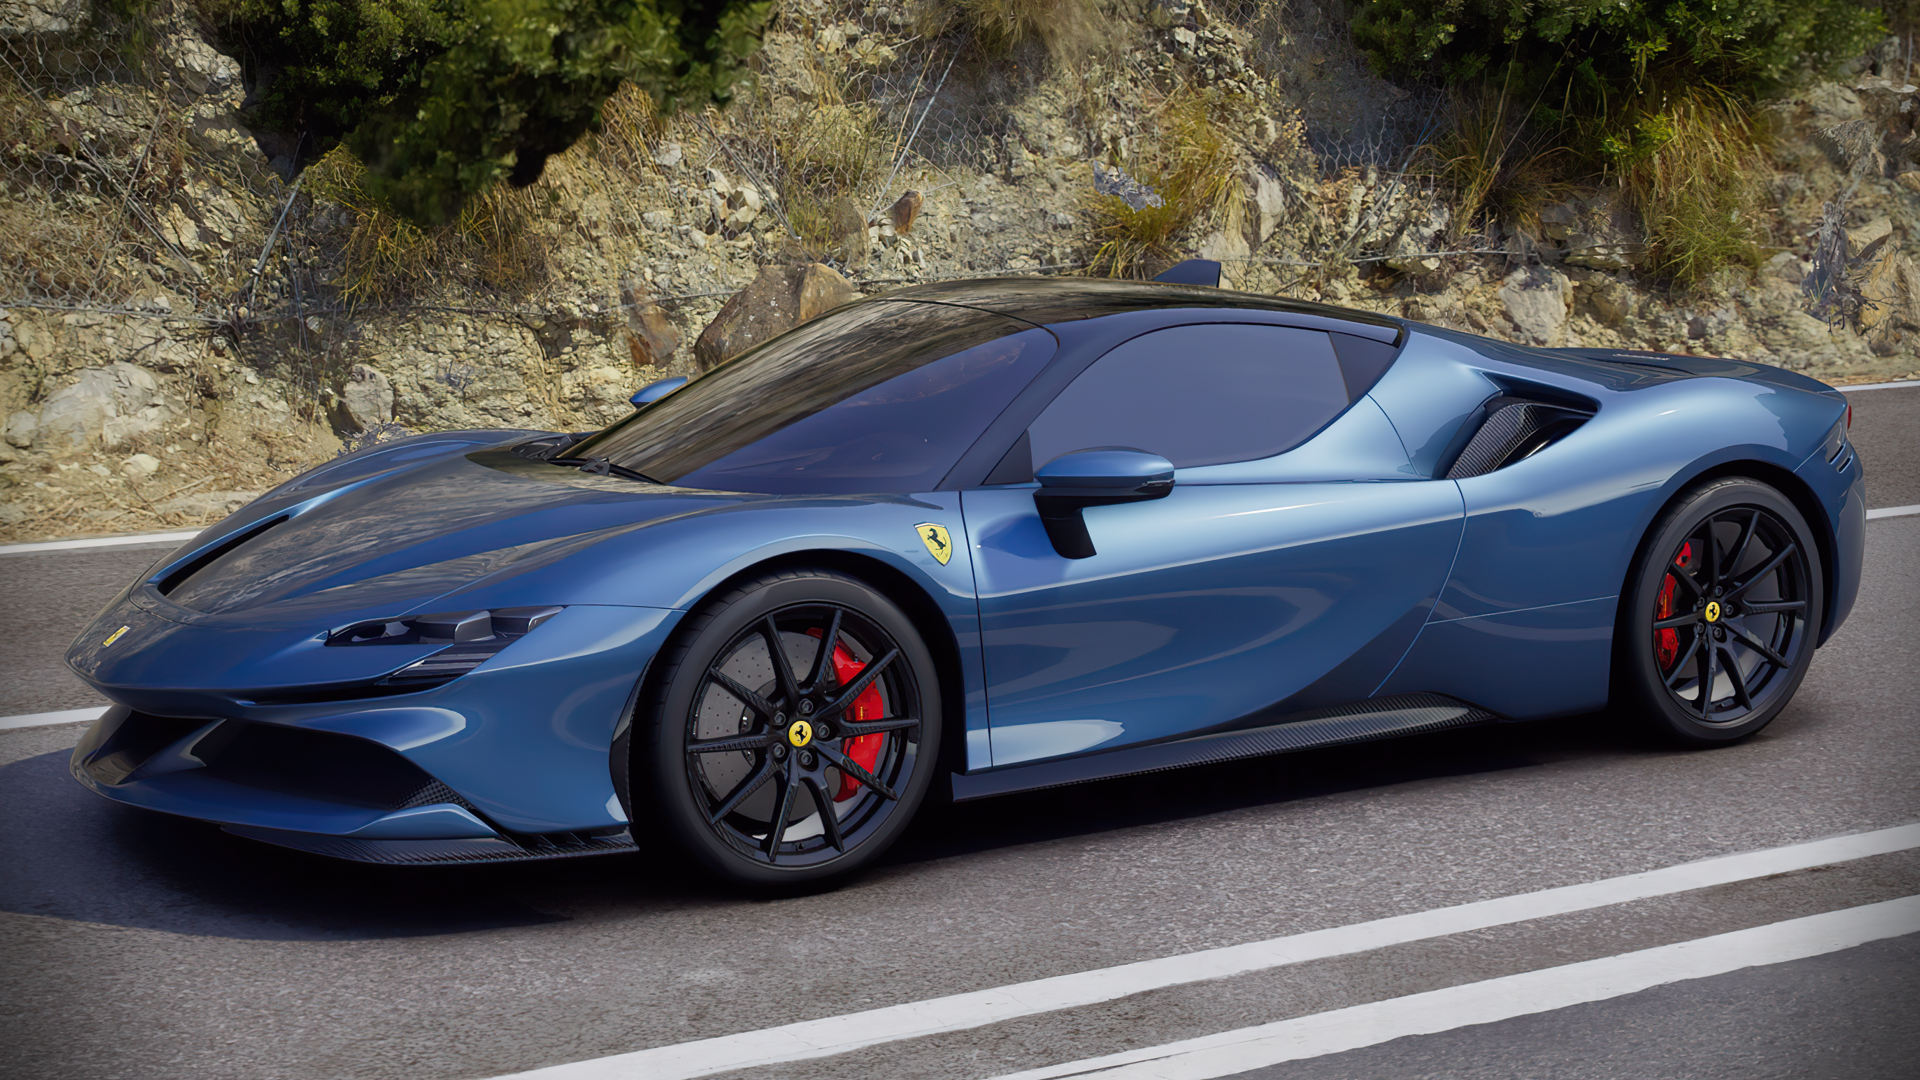 Ferrari Sf90 Stradale Blue Colour Wallpaper